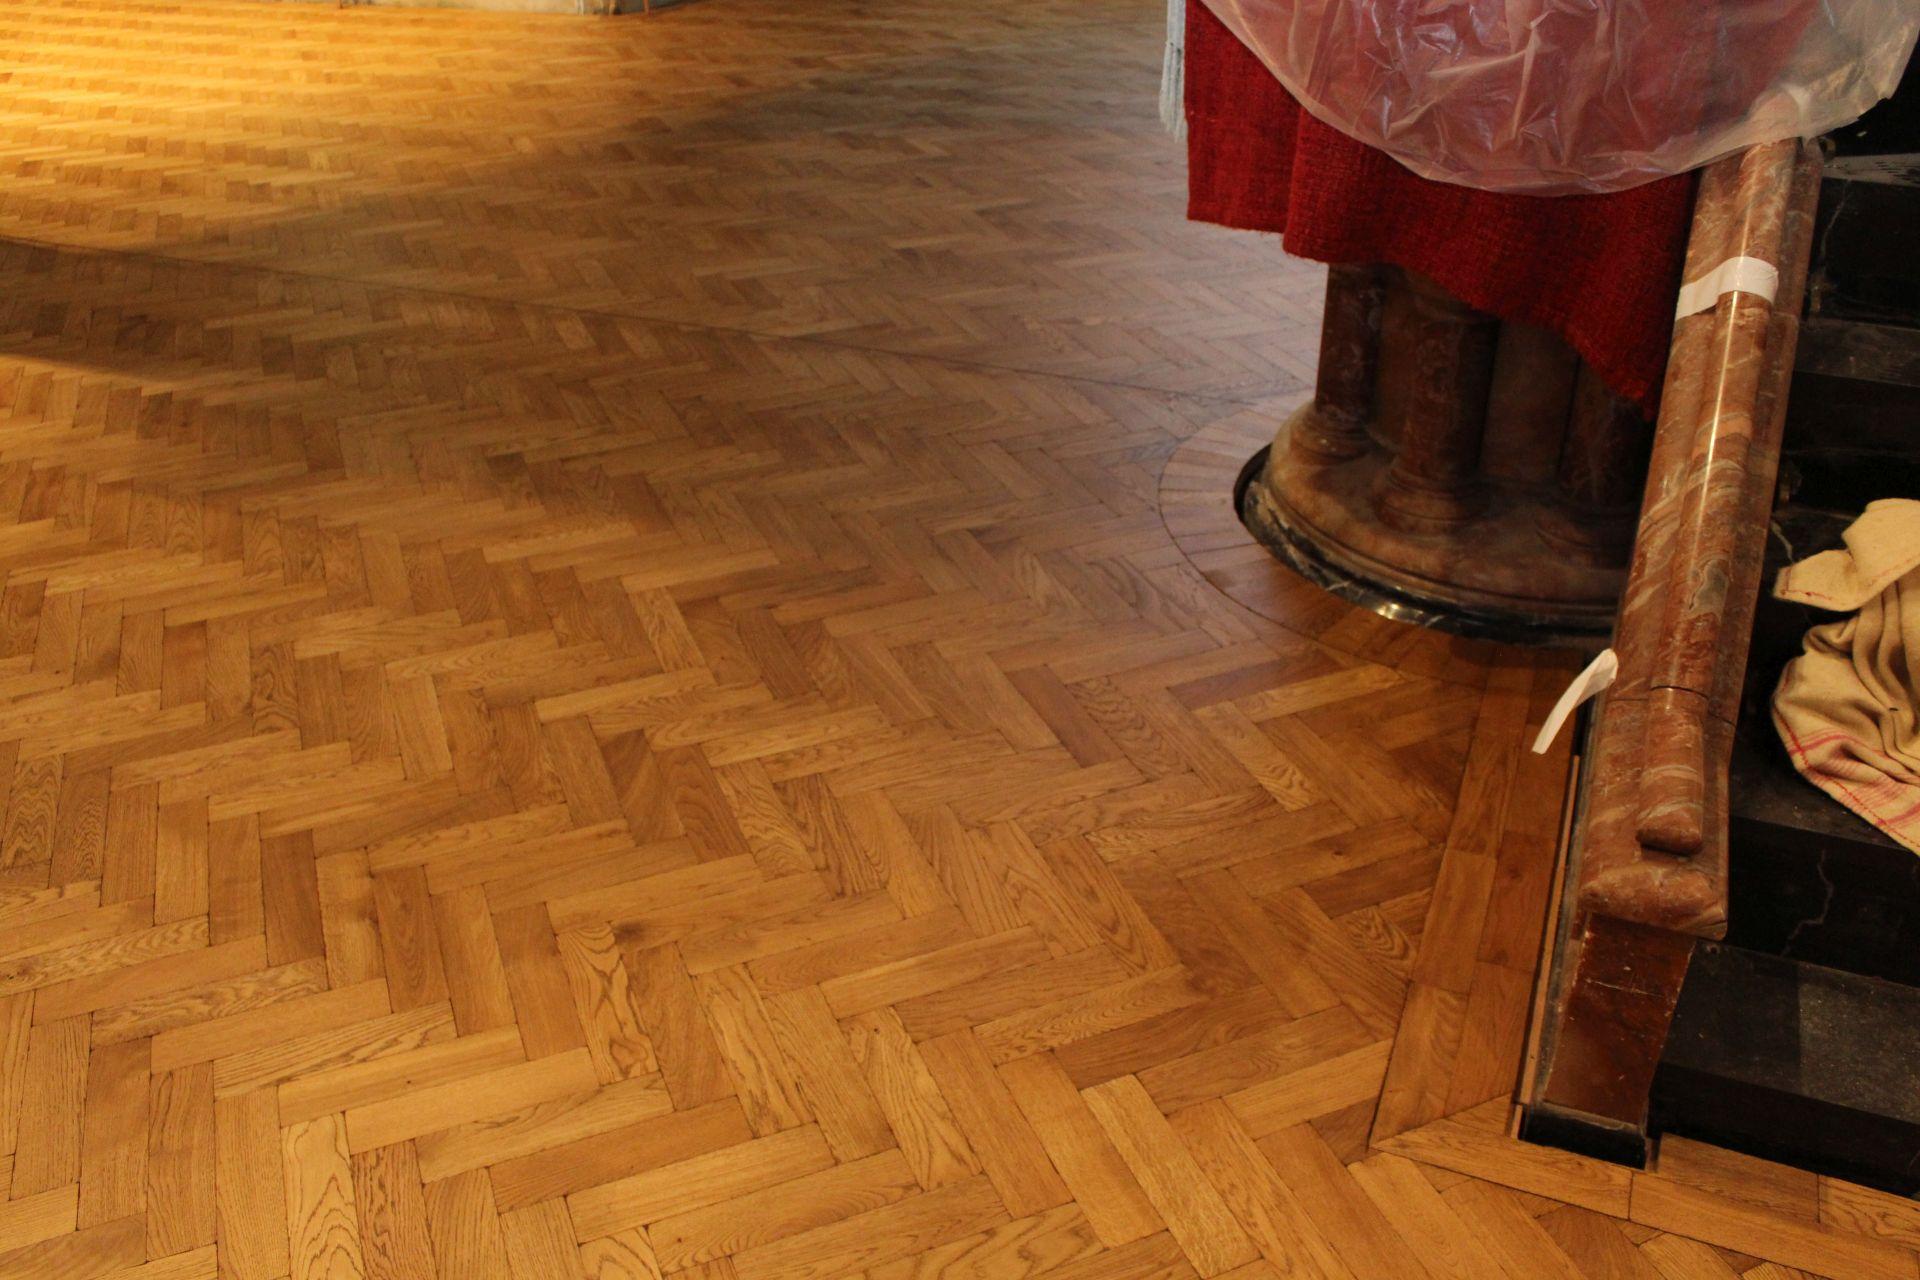 Christ Church wooden floor after renovation